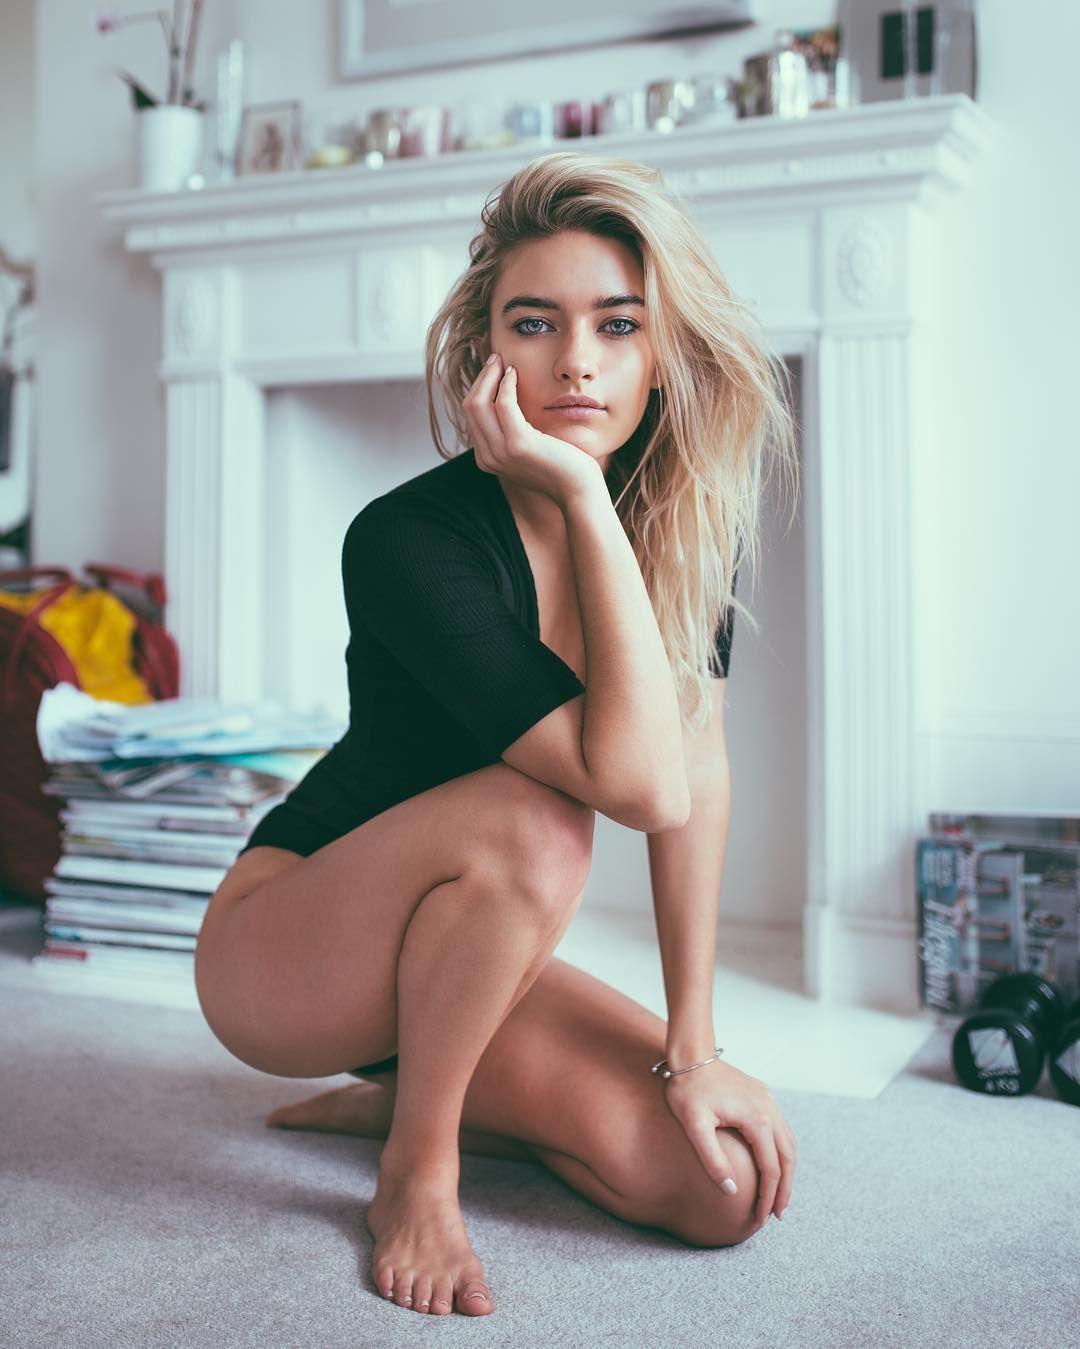 Bikini Twitter Tess Jantschek naked photo 2017